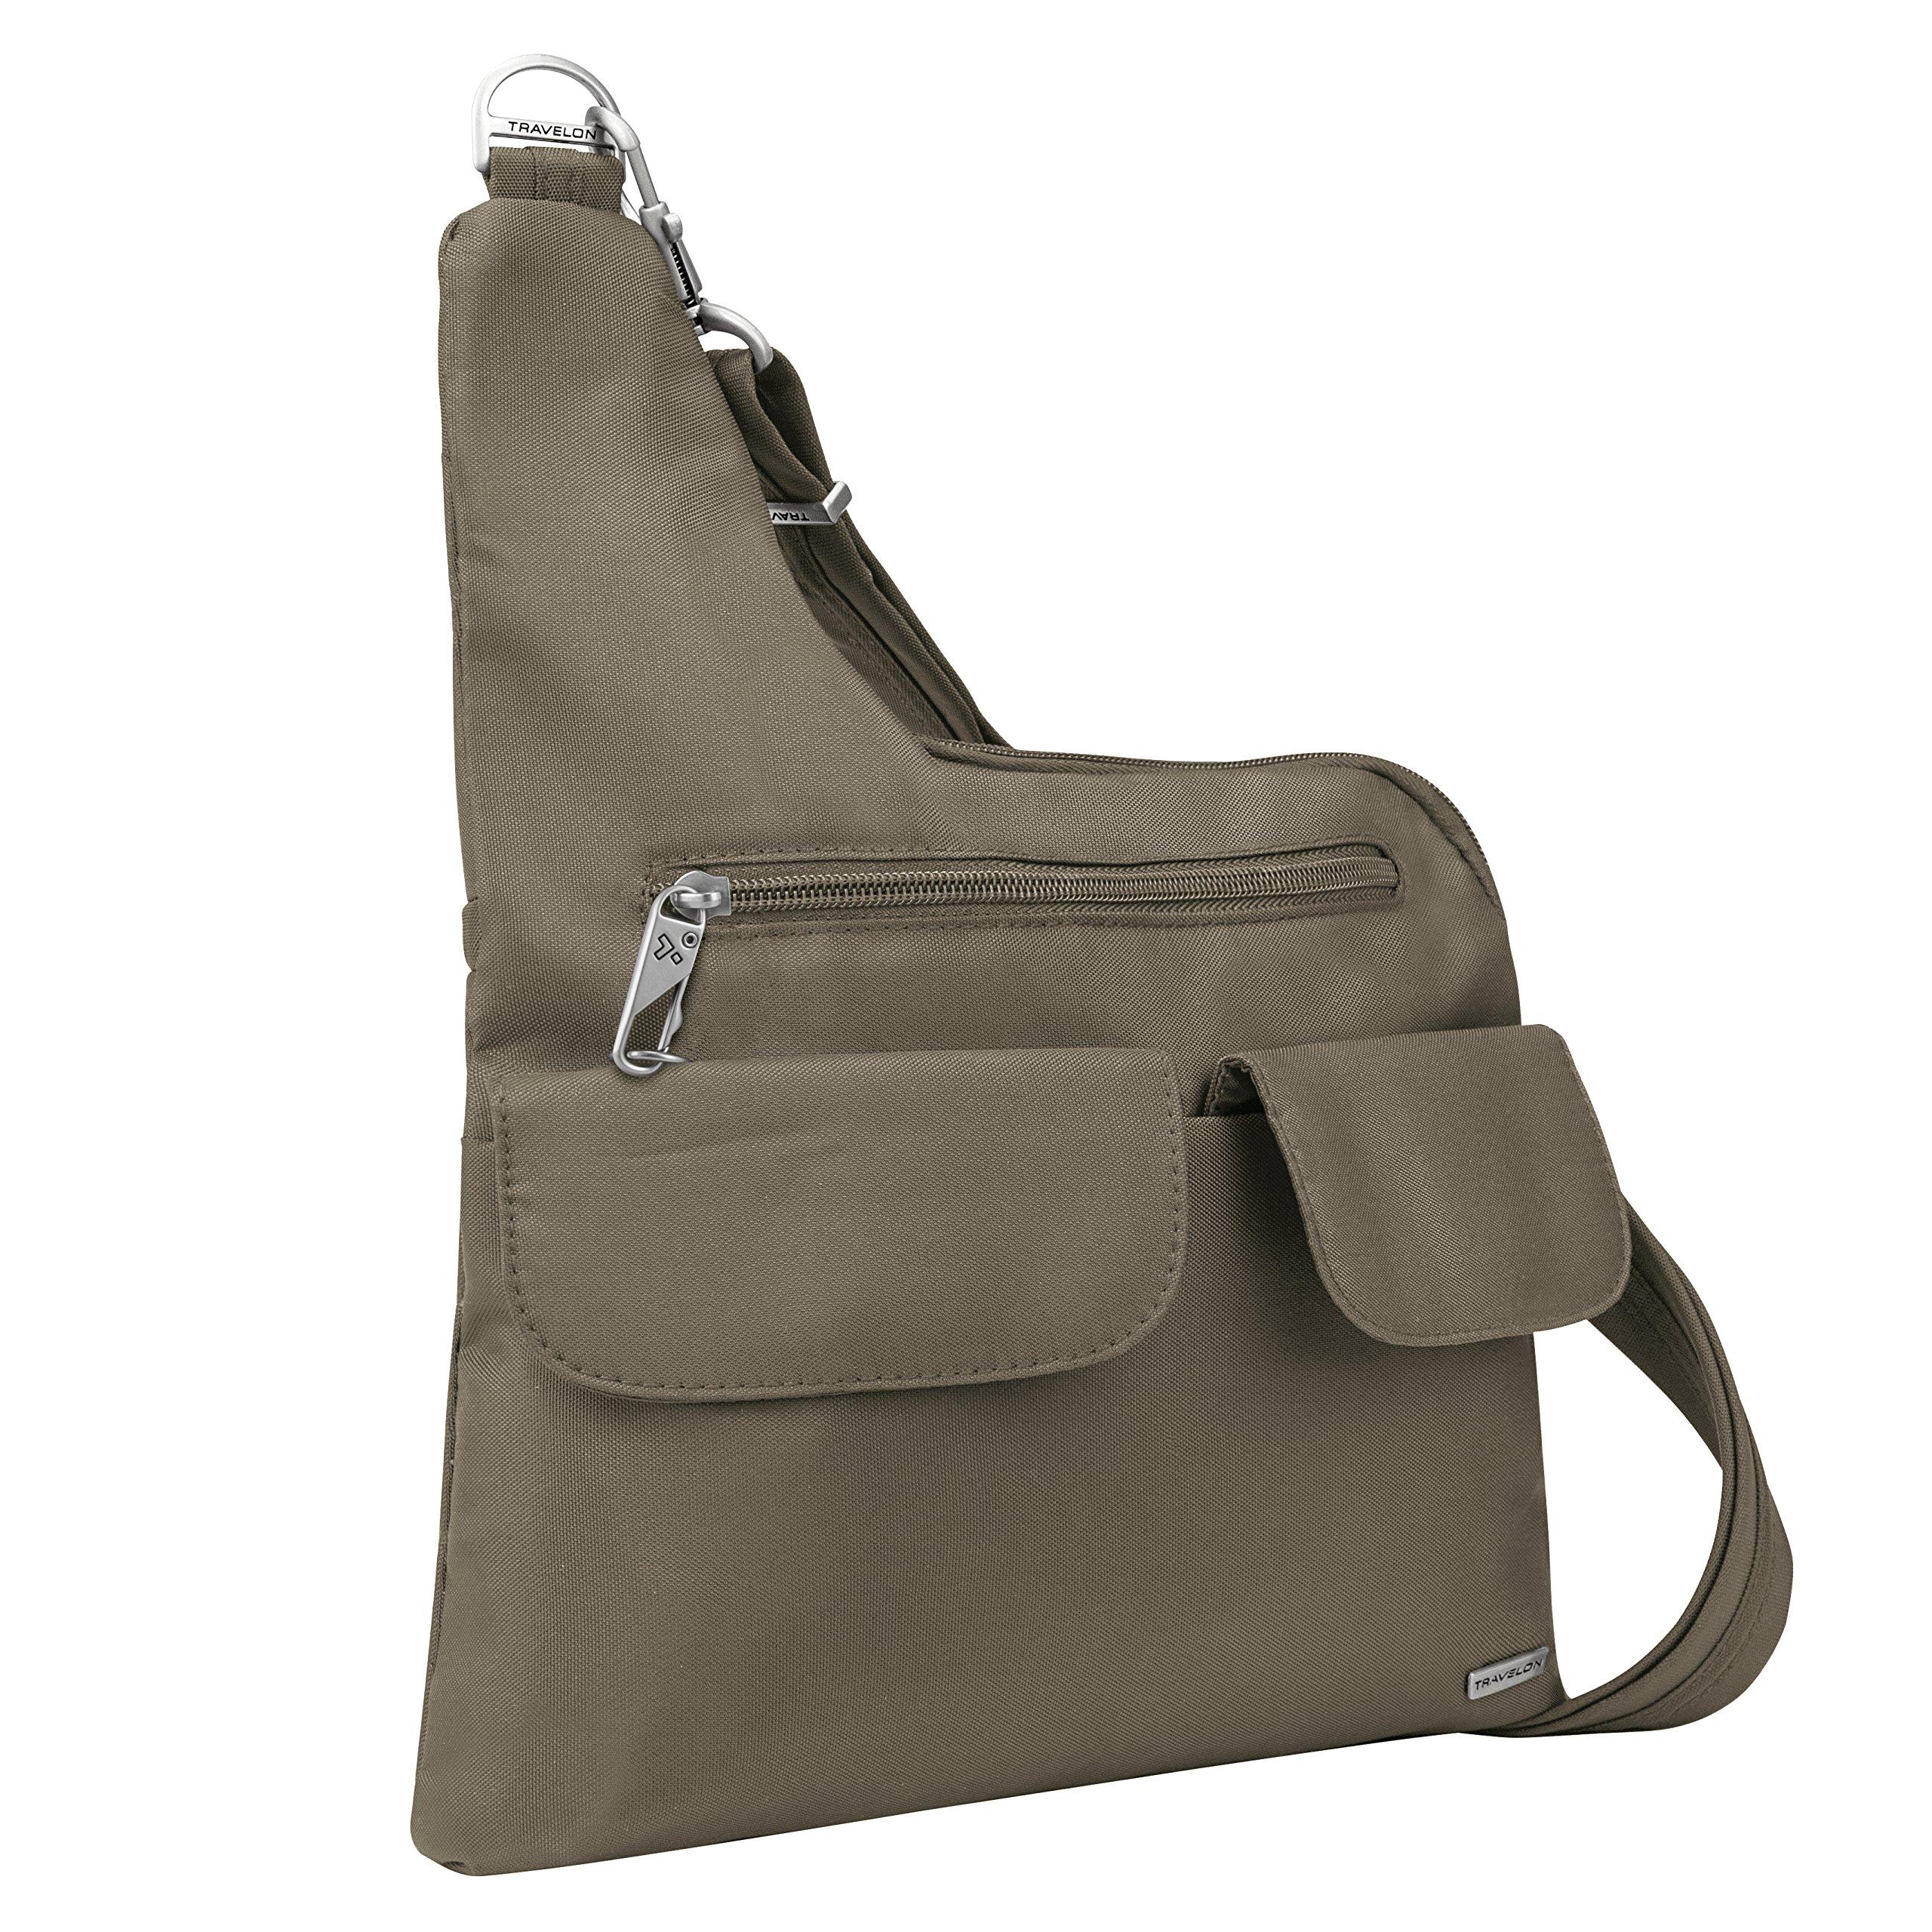 Travelon Anti-theft Cross-body Bag, Nutmeg